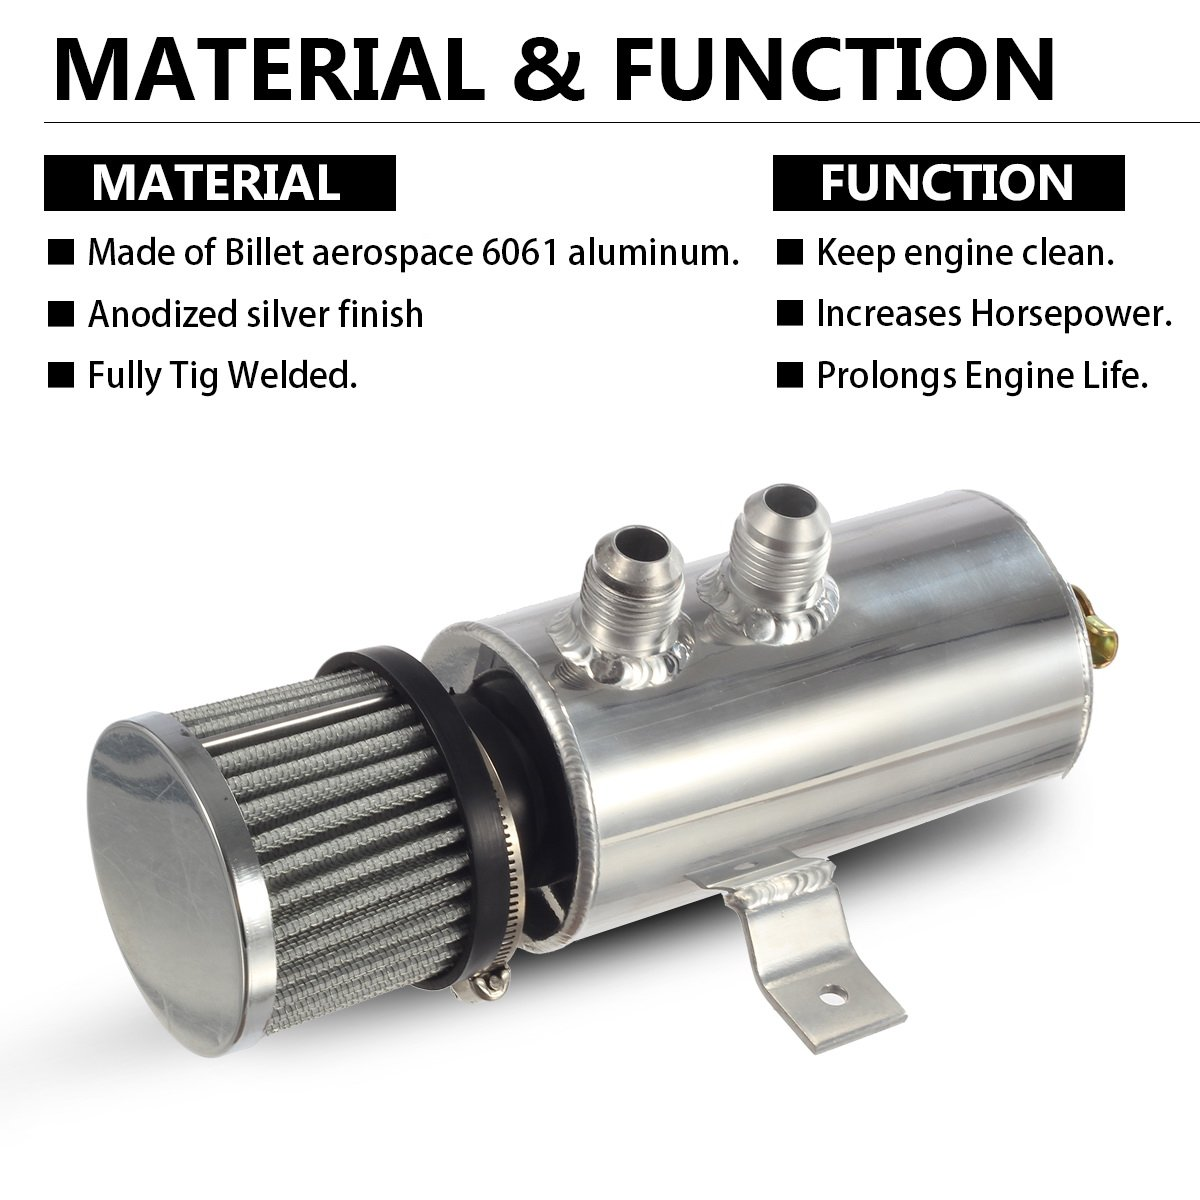 Vincos Universal Aluminum Engine Brushed Baffled Oil Chrysler 3 8 Coolant System Diagram Catch Can Kit Overflow Tank Reservoir 750ml W Breather Filter Cylinder 2 Front